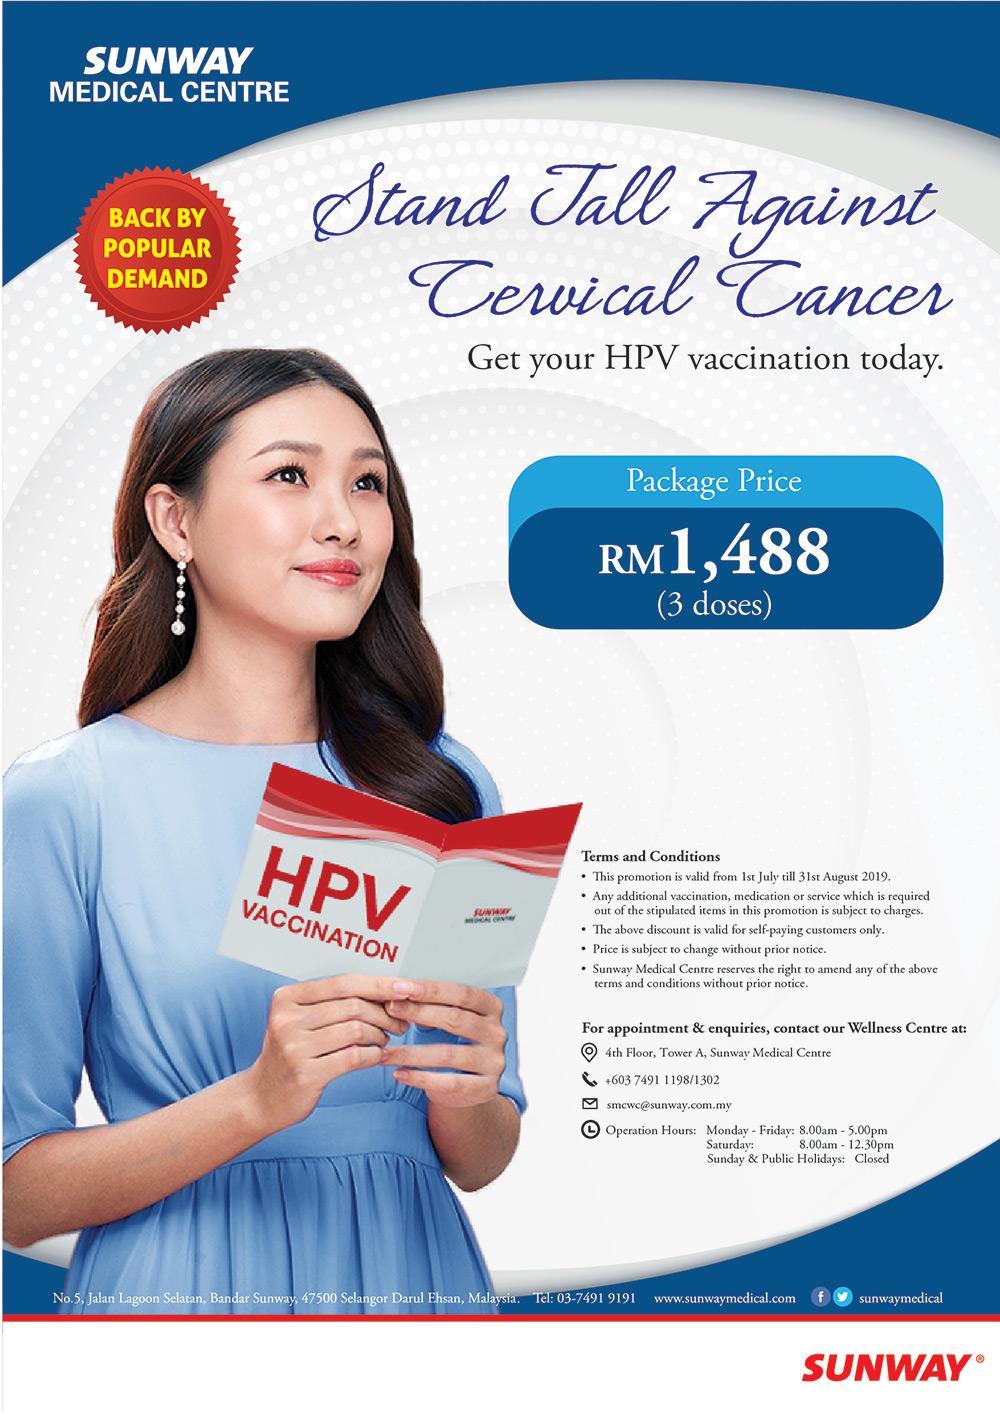 hpv vaccine pris 2019)